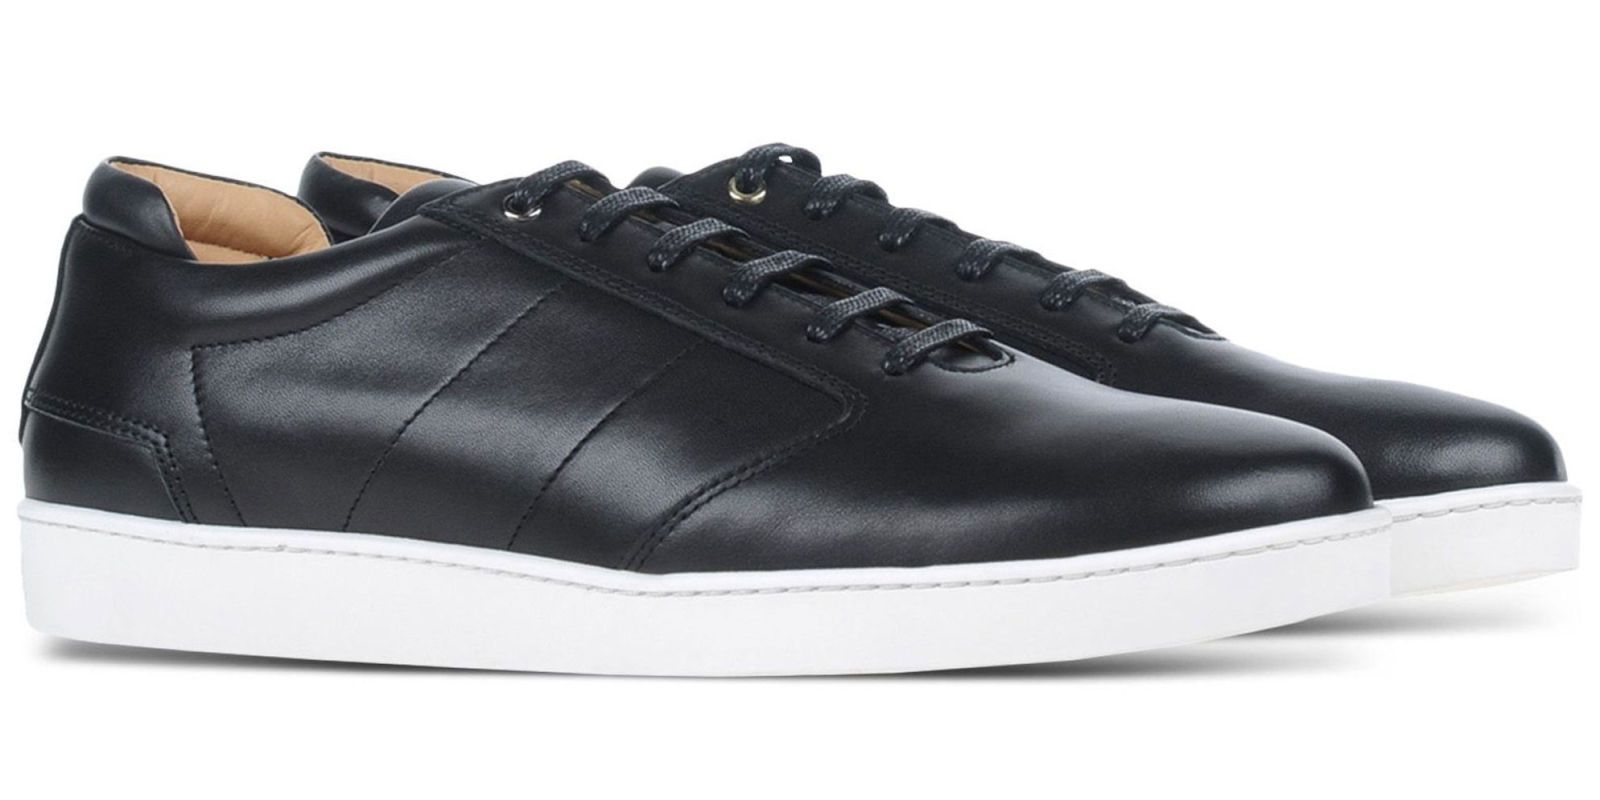 FOOTWEAR - Low-tops & sneakers Les Essentiels QXHcznYdj